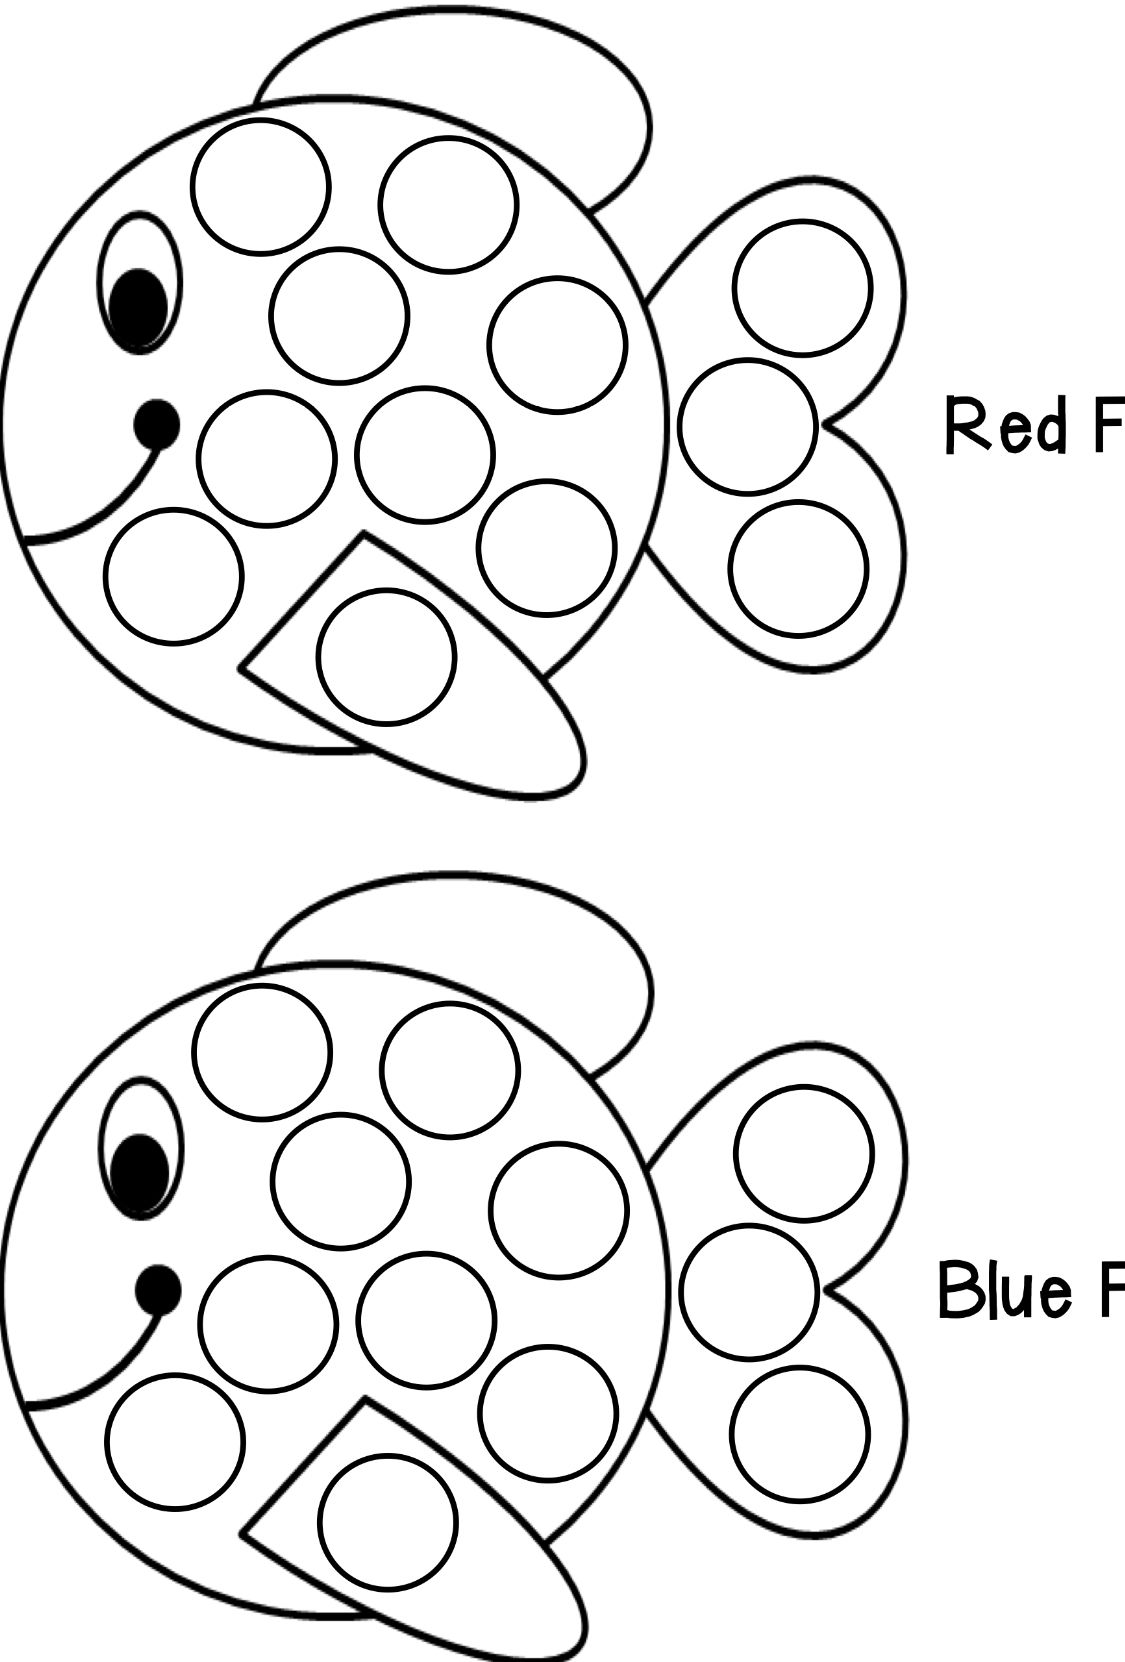 Ladybug Dot Painting Coloring Page Vozeli Com